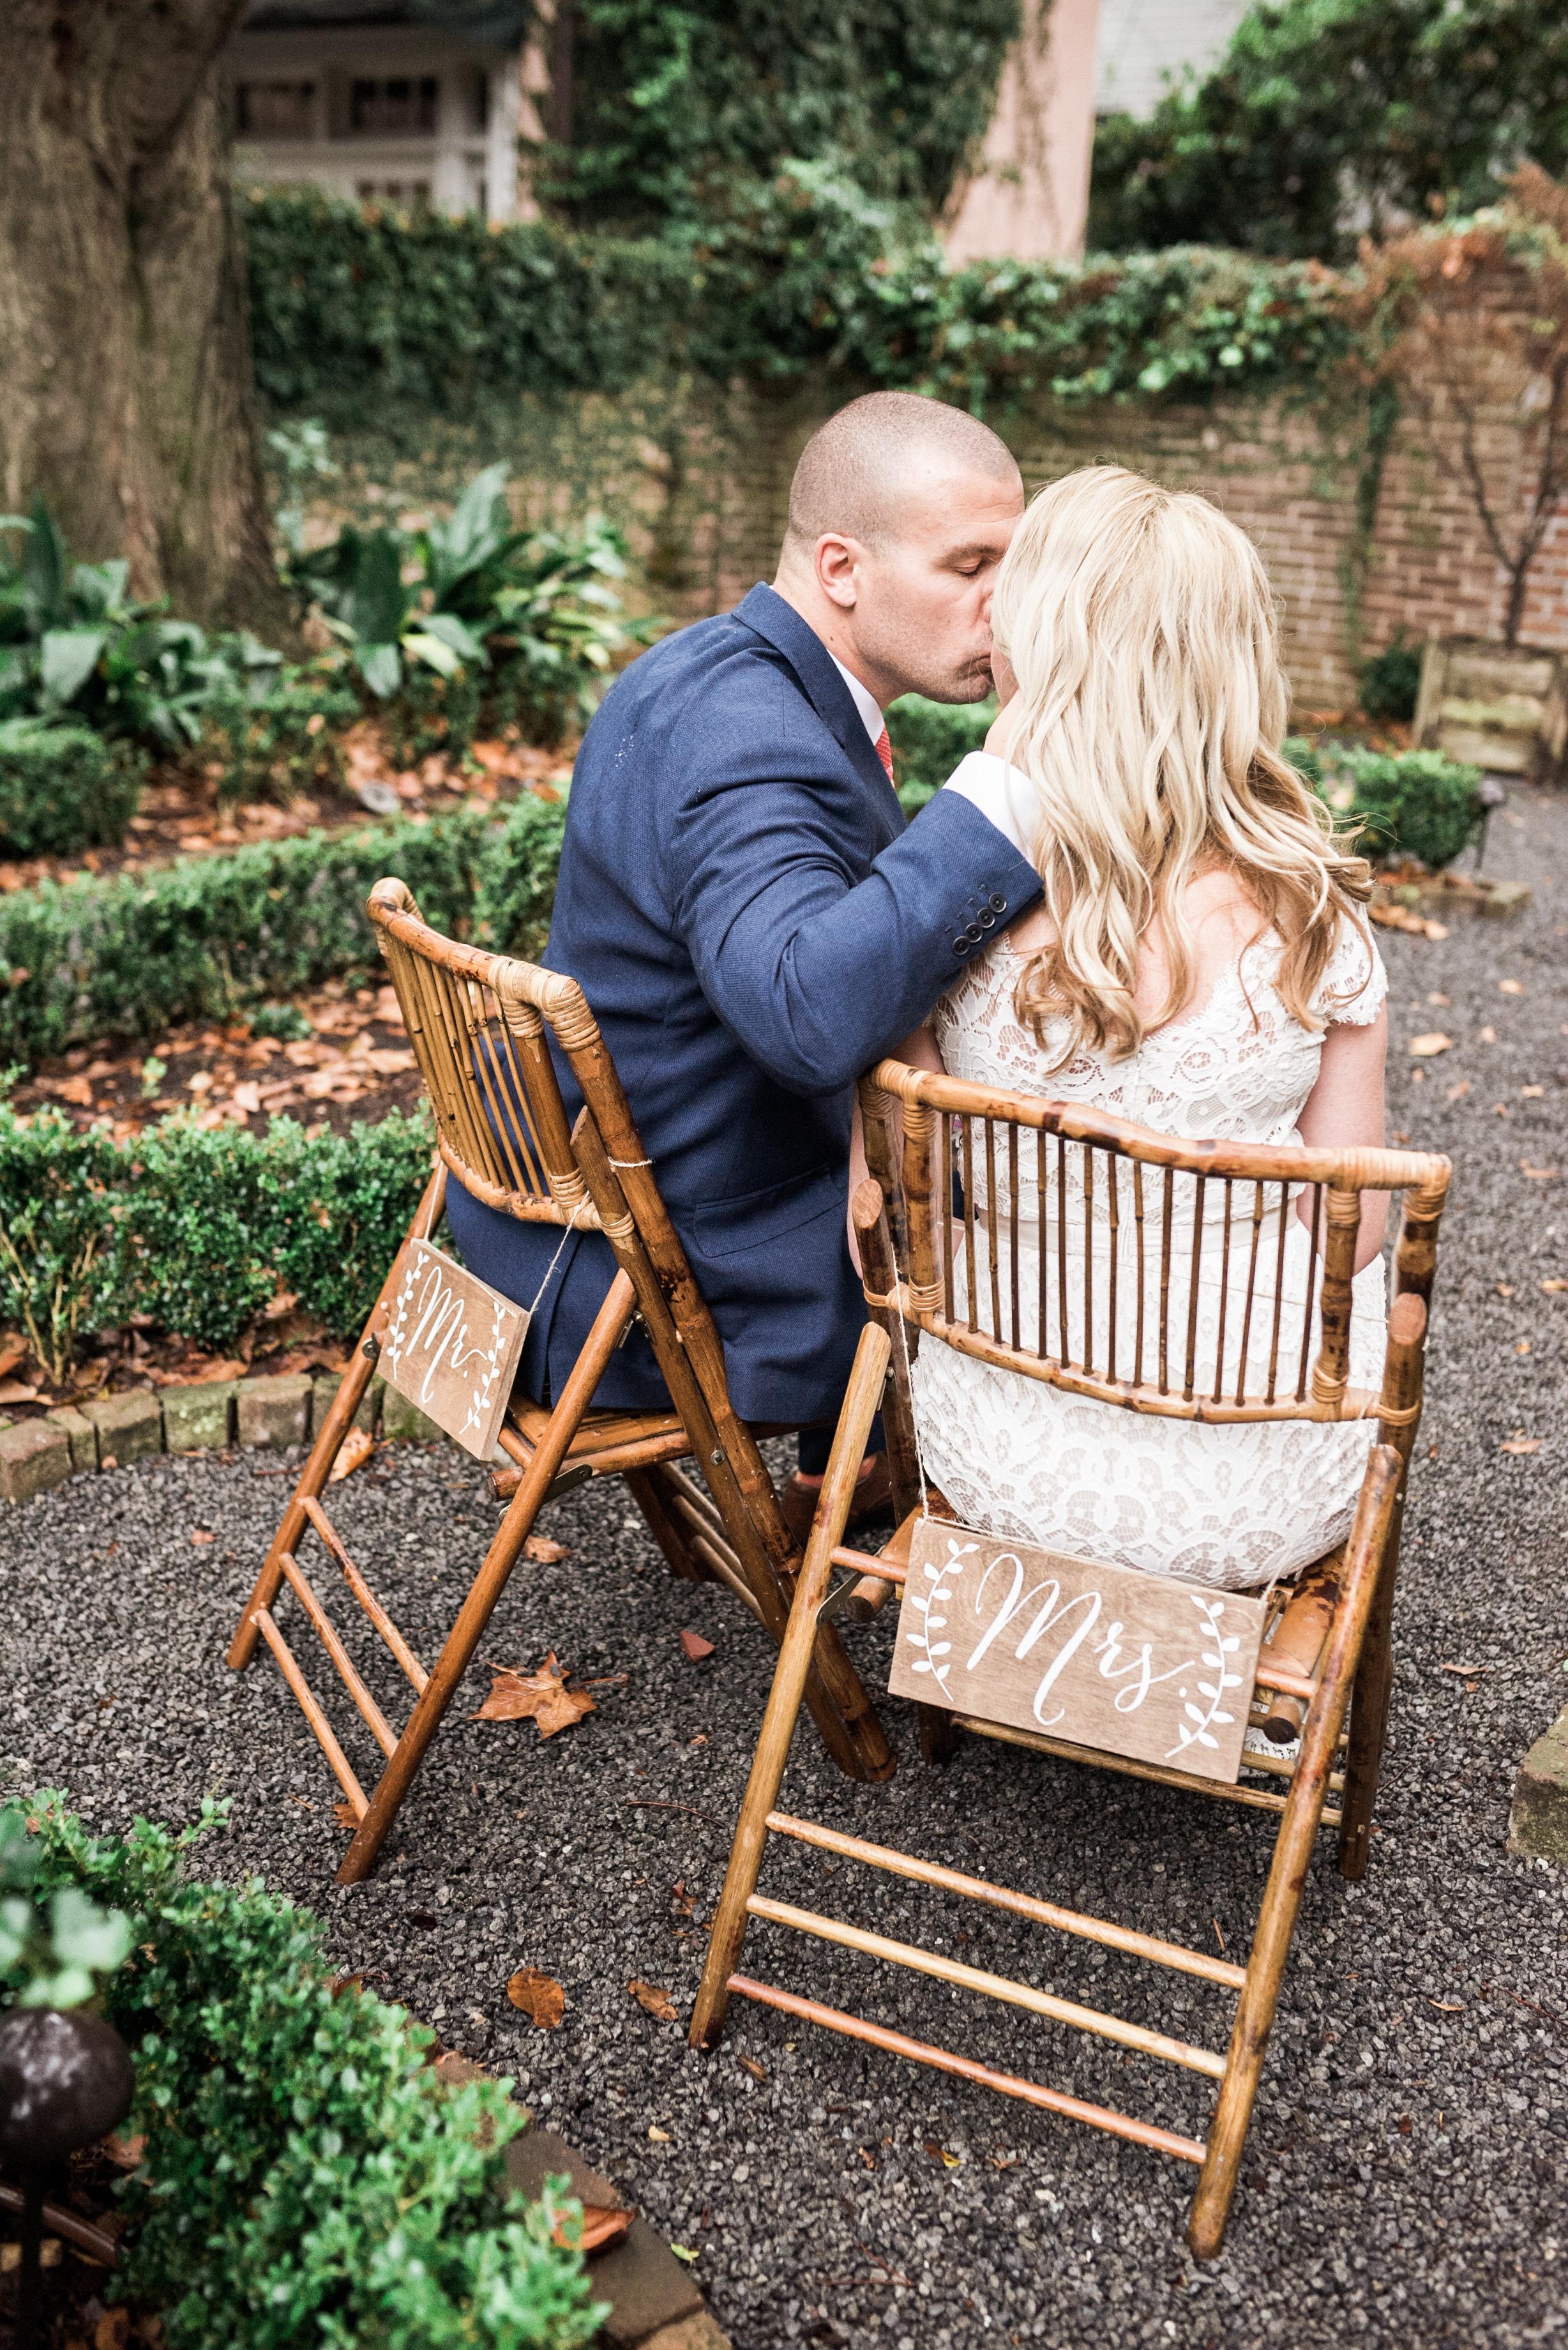 charleston elopement planners, scarlet plan & design, coral, tangerine, hot pink, peach intimate wedding (99).jpg